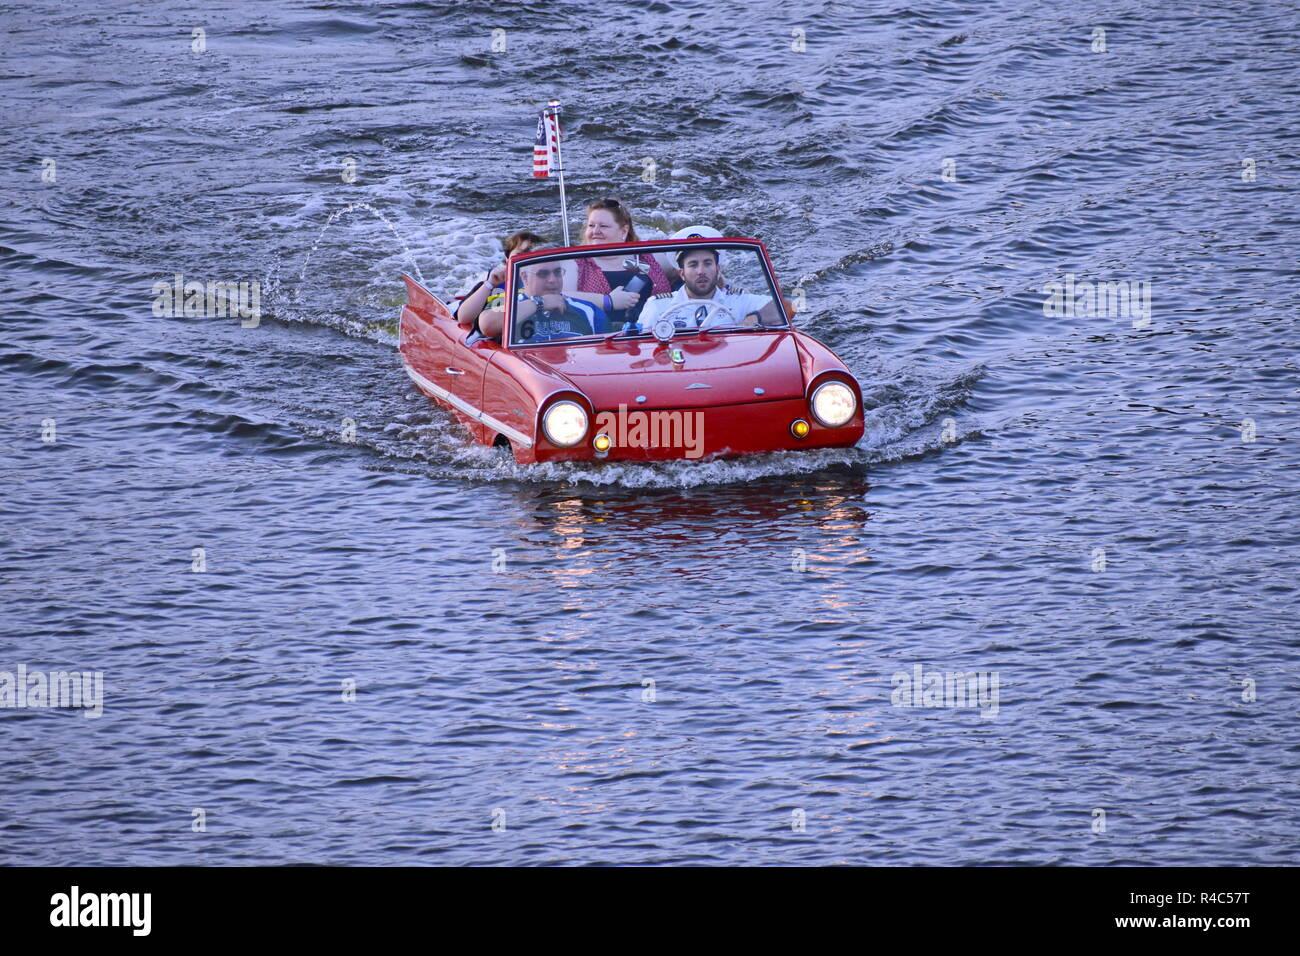 Orlando, Florida.  November 25, 2018 Nice family having fun red Amphicar ride over the blue lake  at Lake Buena Vista area - Stock Image